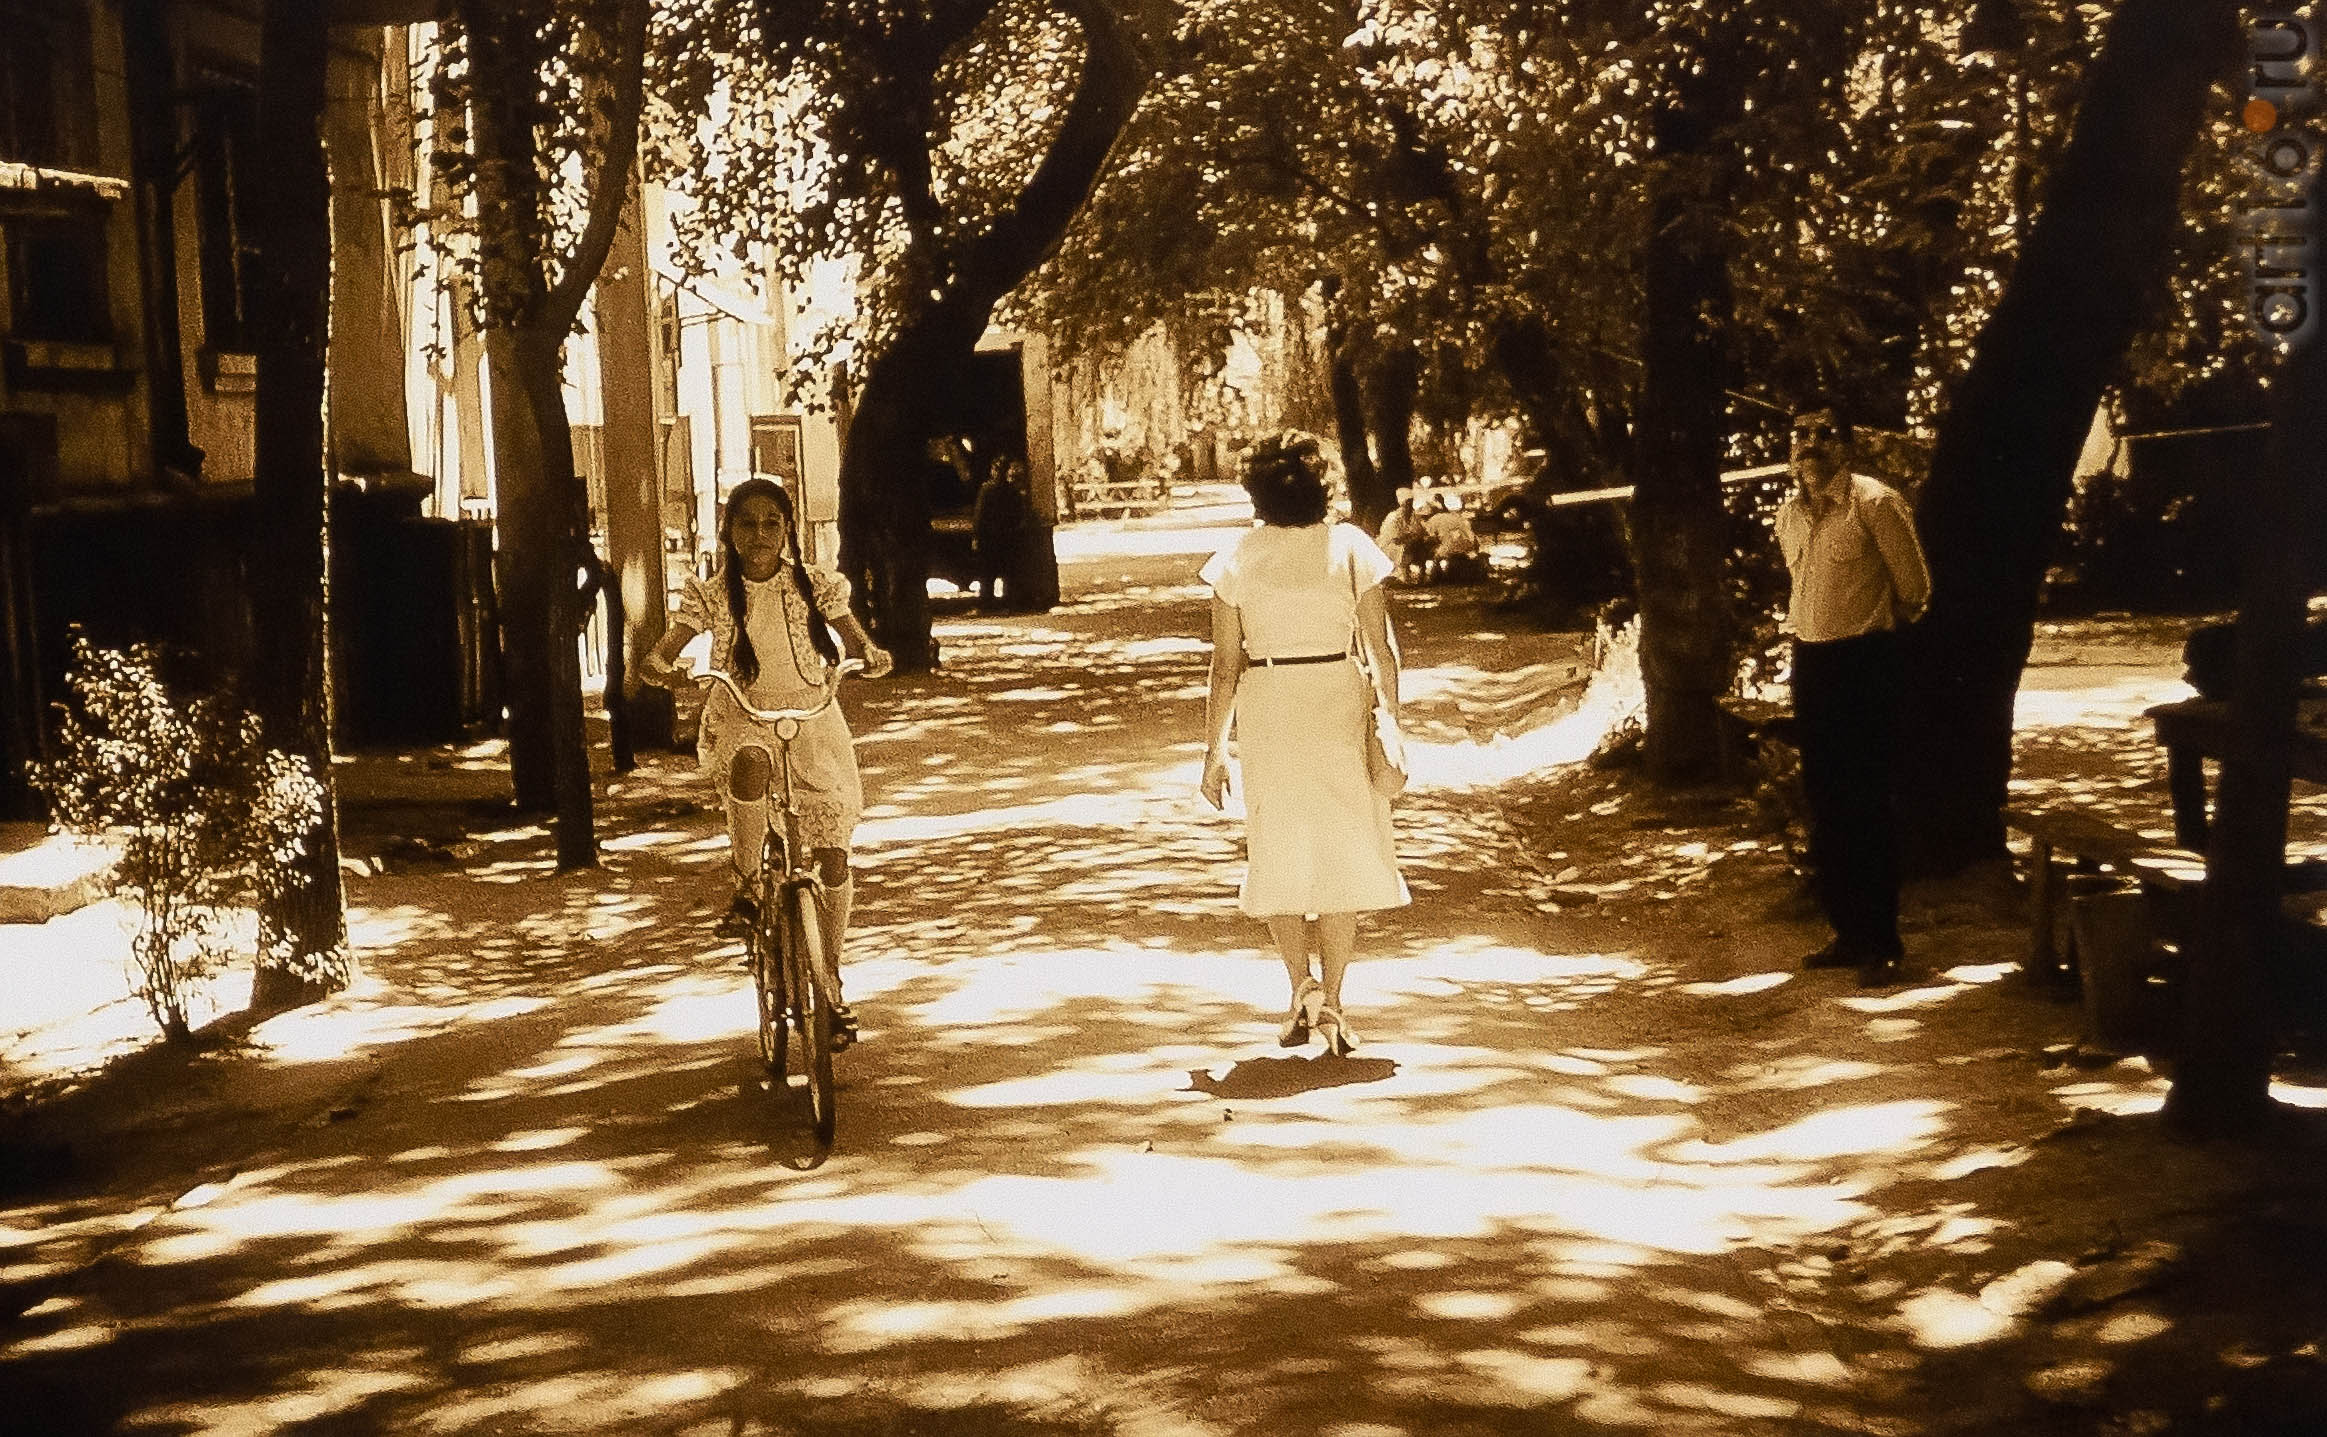 Фото из архива Александра Акилова::Александр Акилов. К солнцу